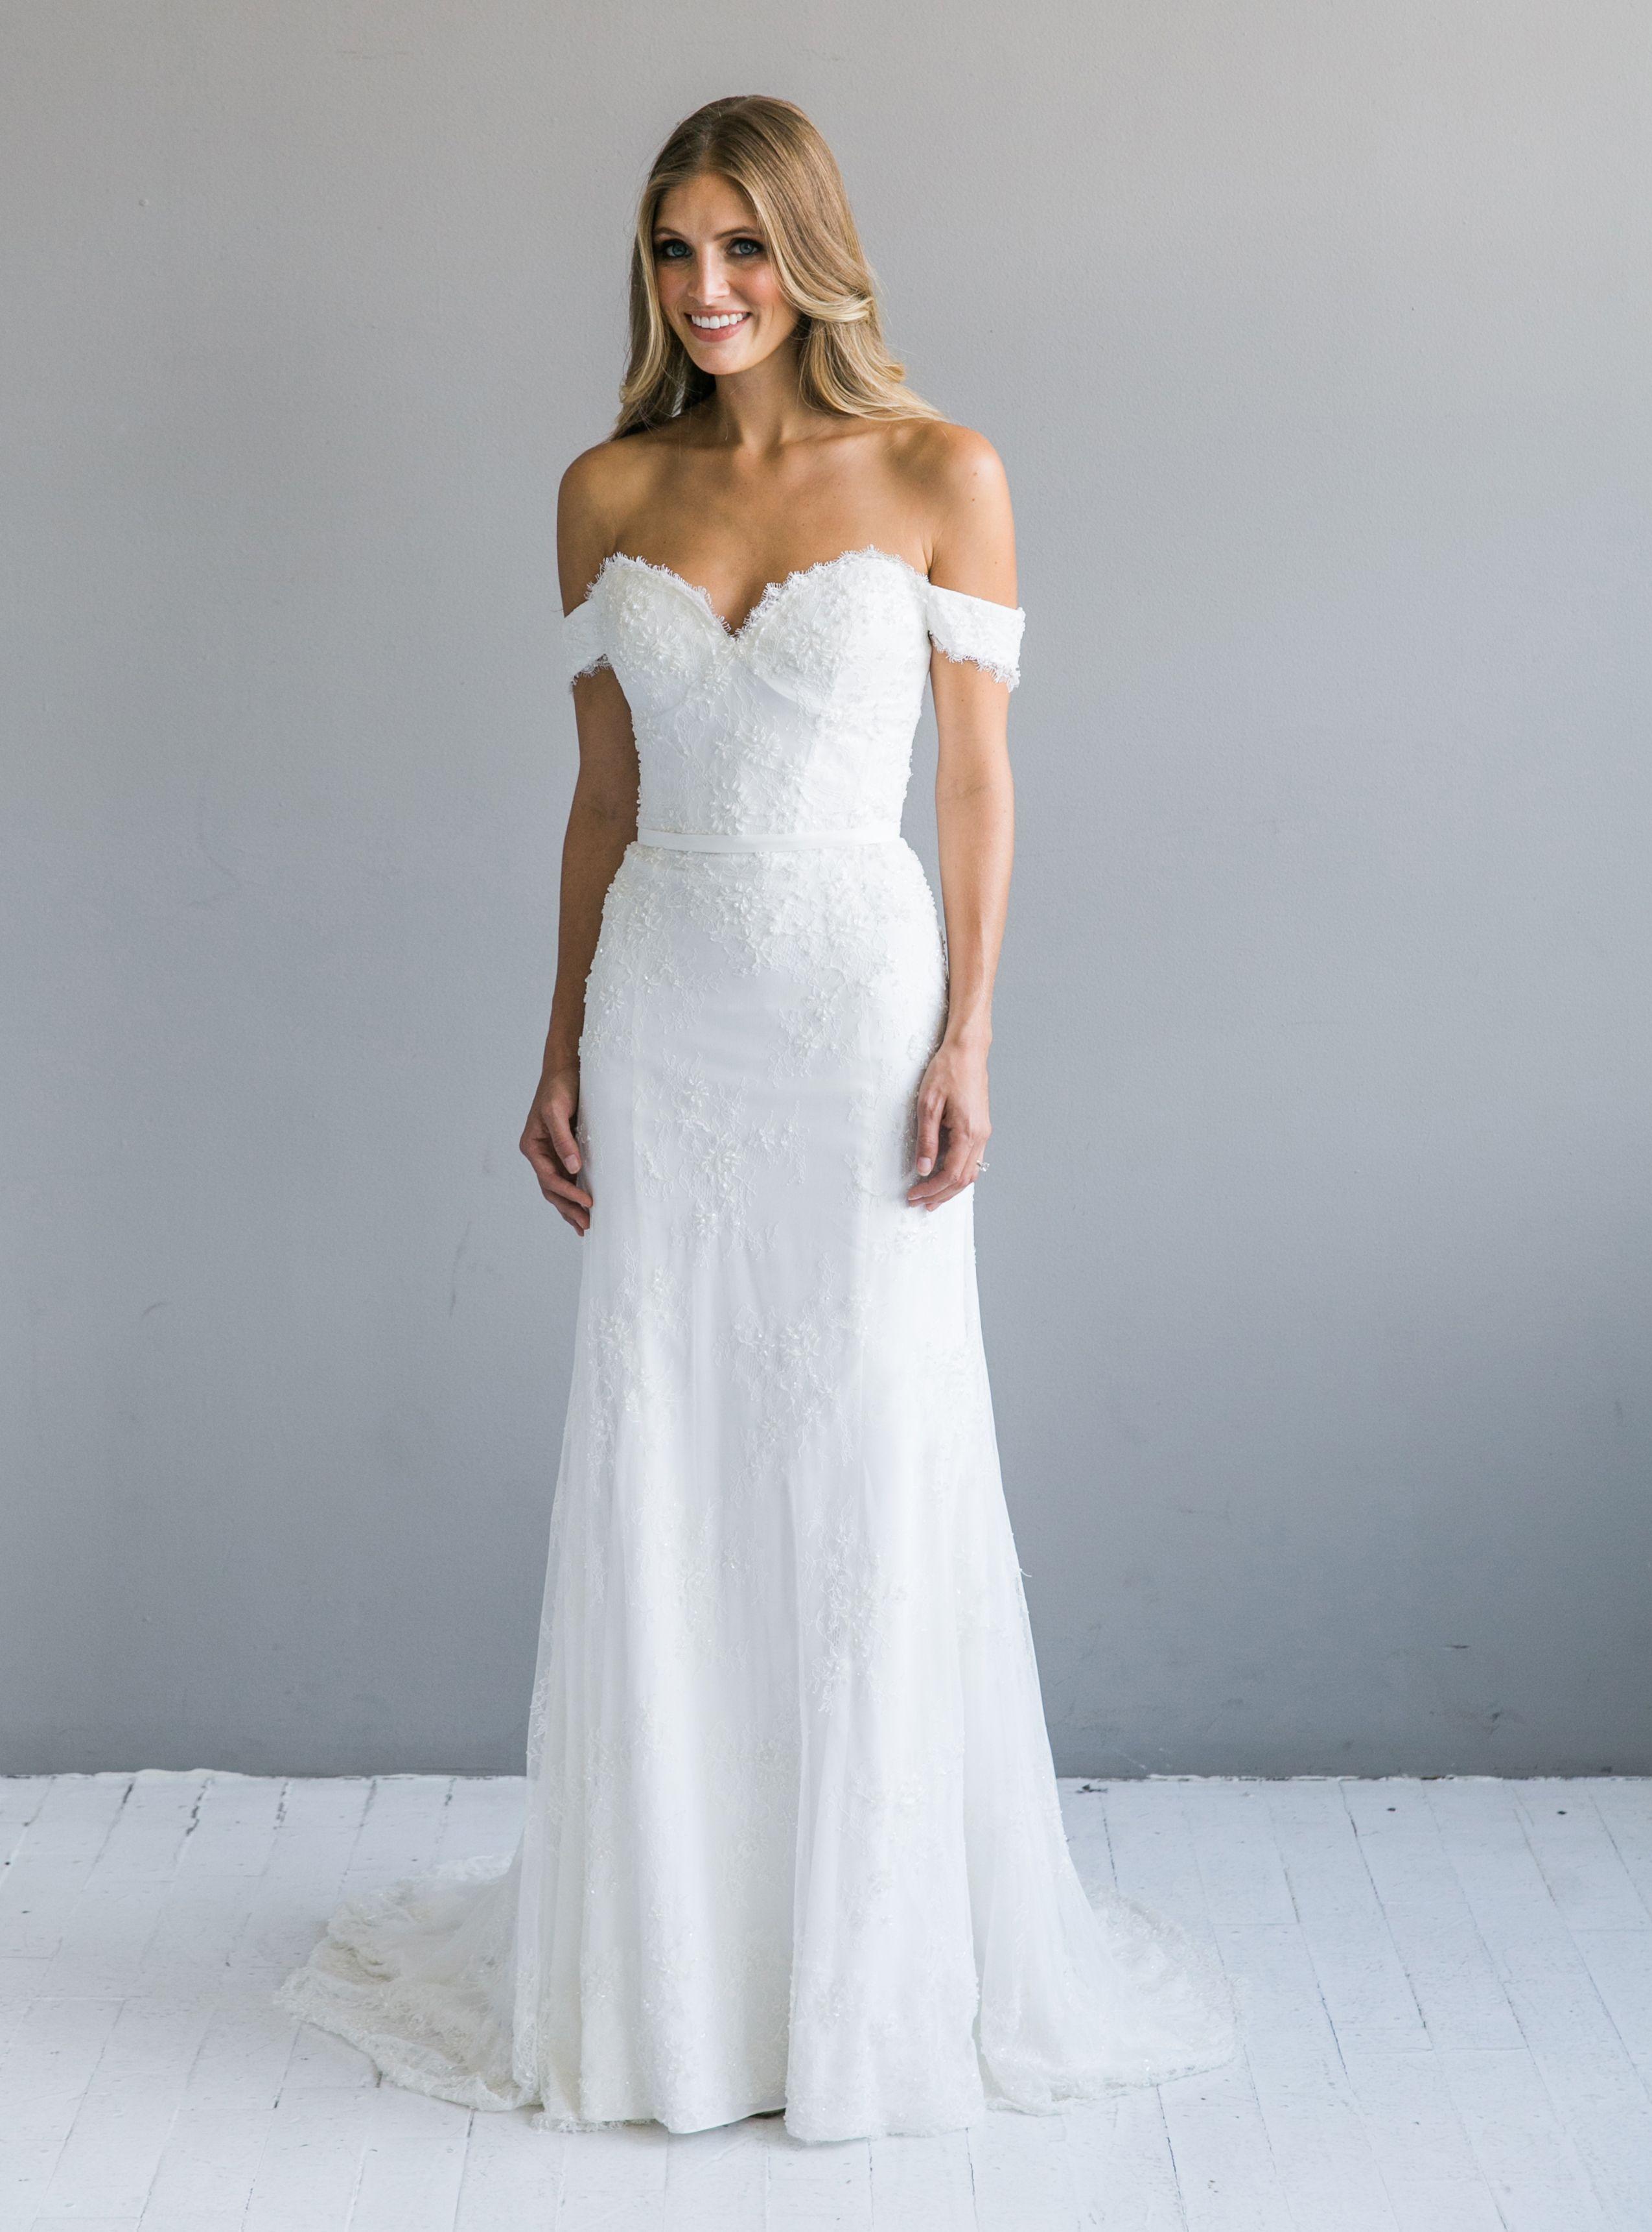 Desiree Hartsock Bridal / ISLA | Stunning Bridal Style | Pinterest ...